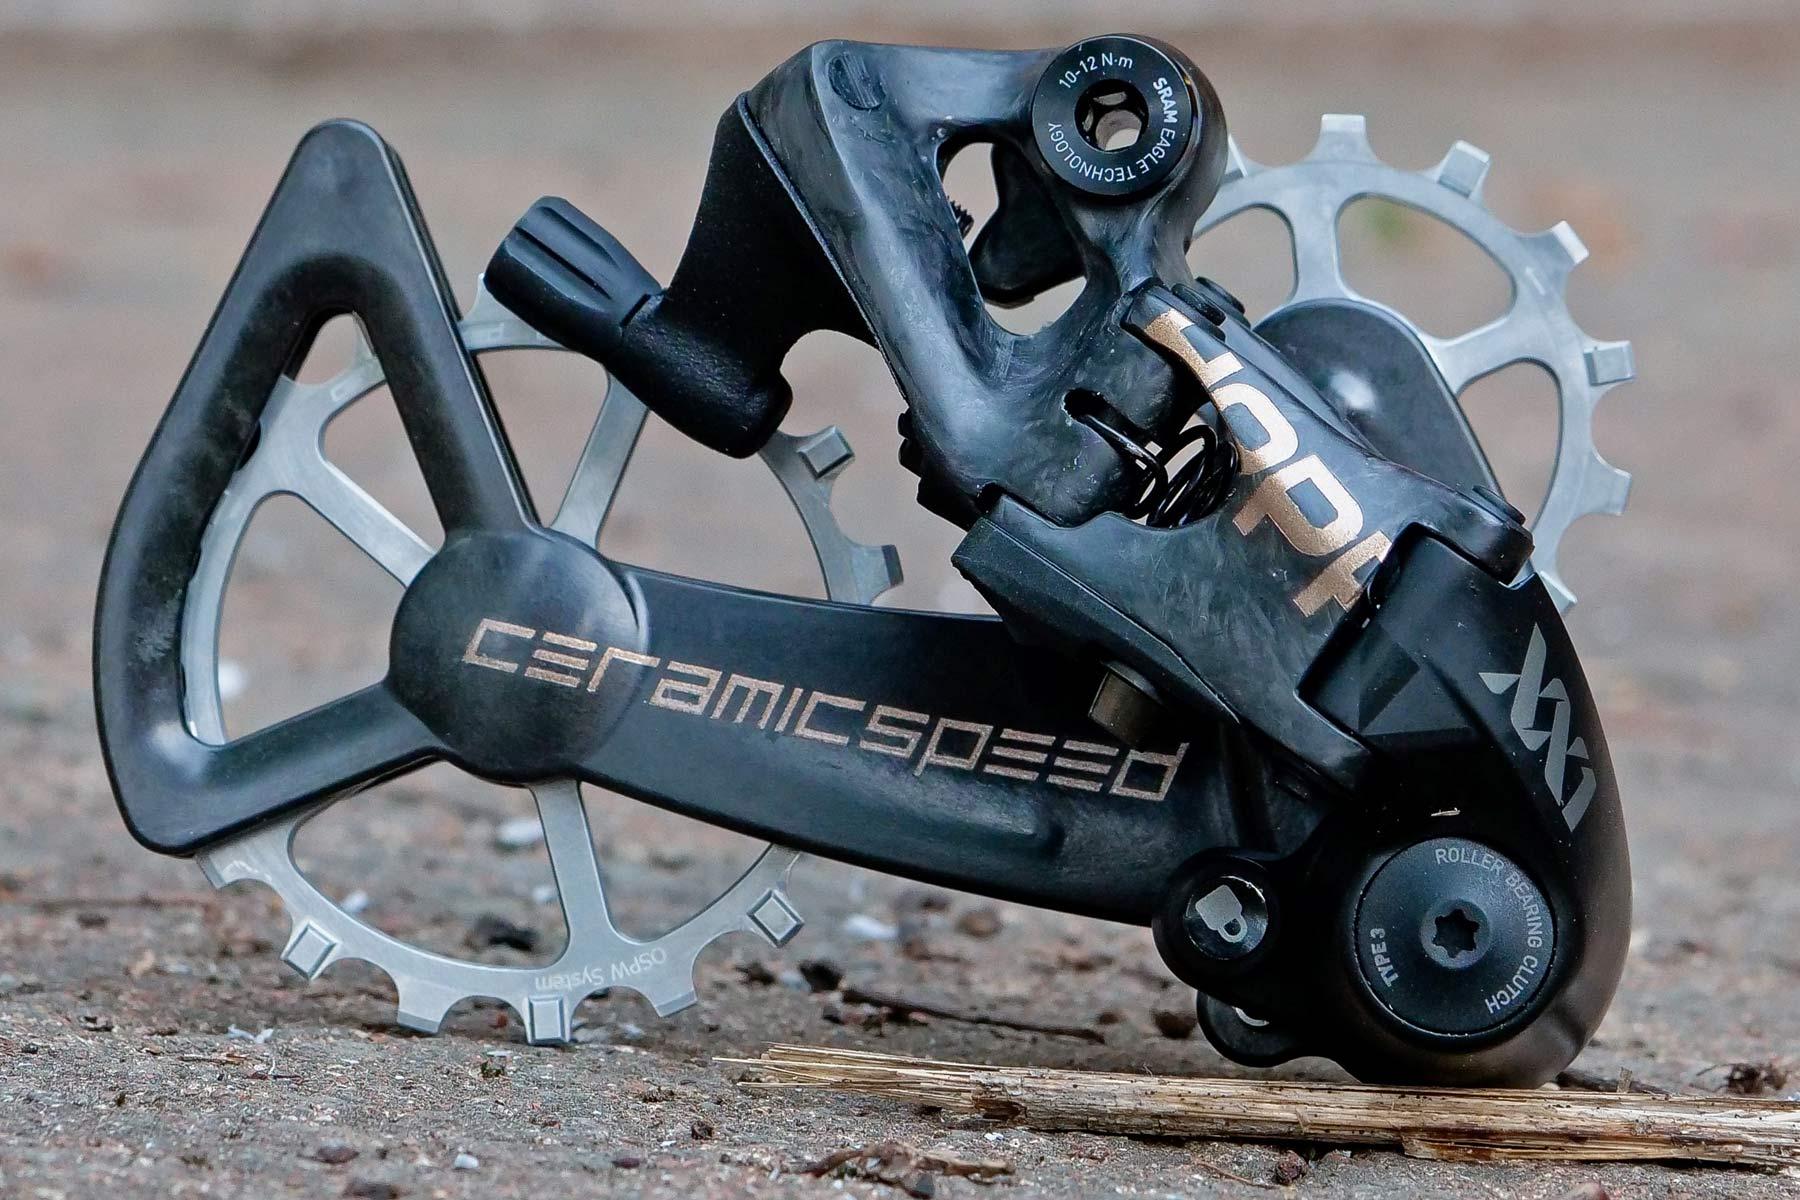 custom Scott Addict Gravel Tuned Dangerholm edition lightweight carbon prototype gravel bike project,Hopp-ed derailleur